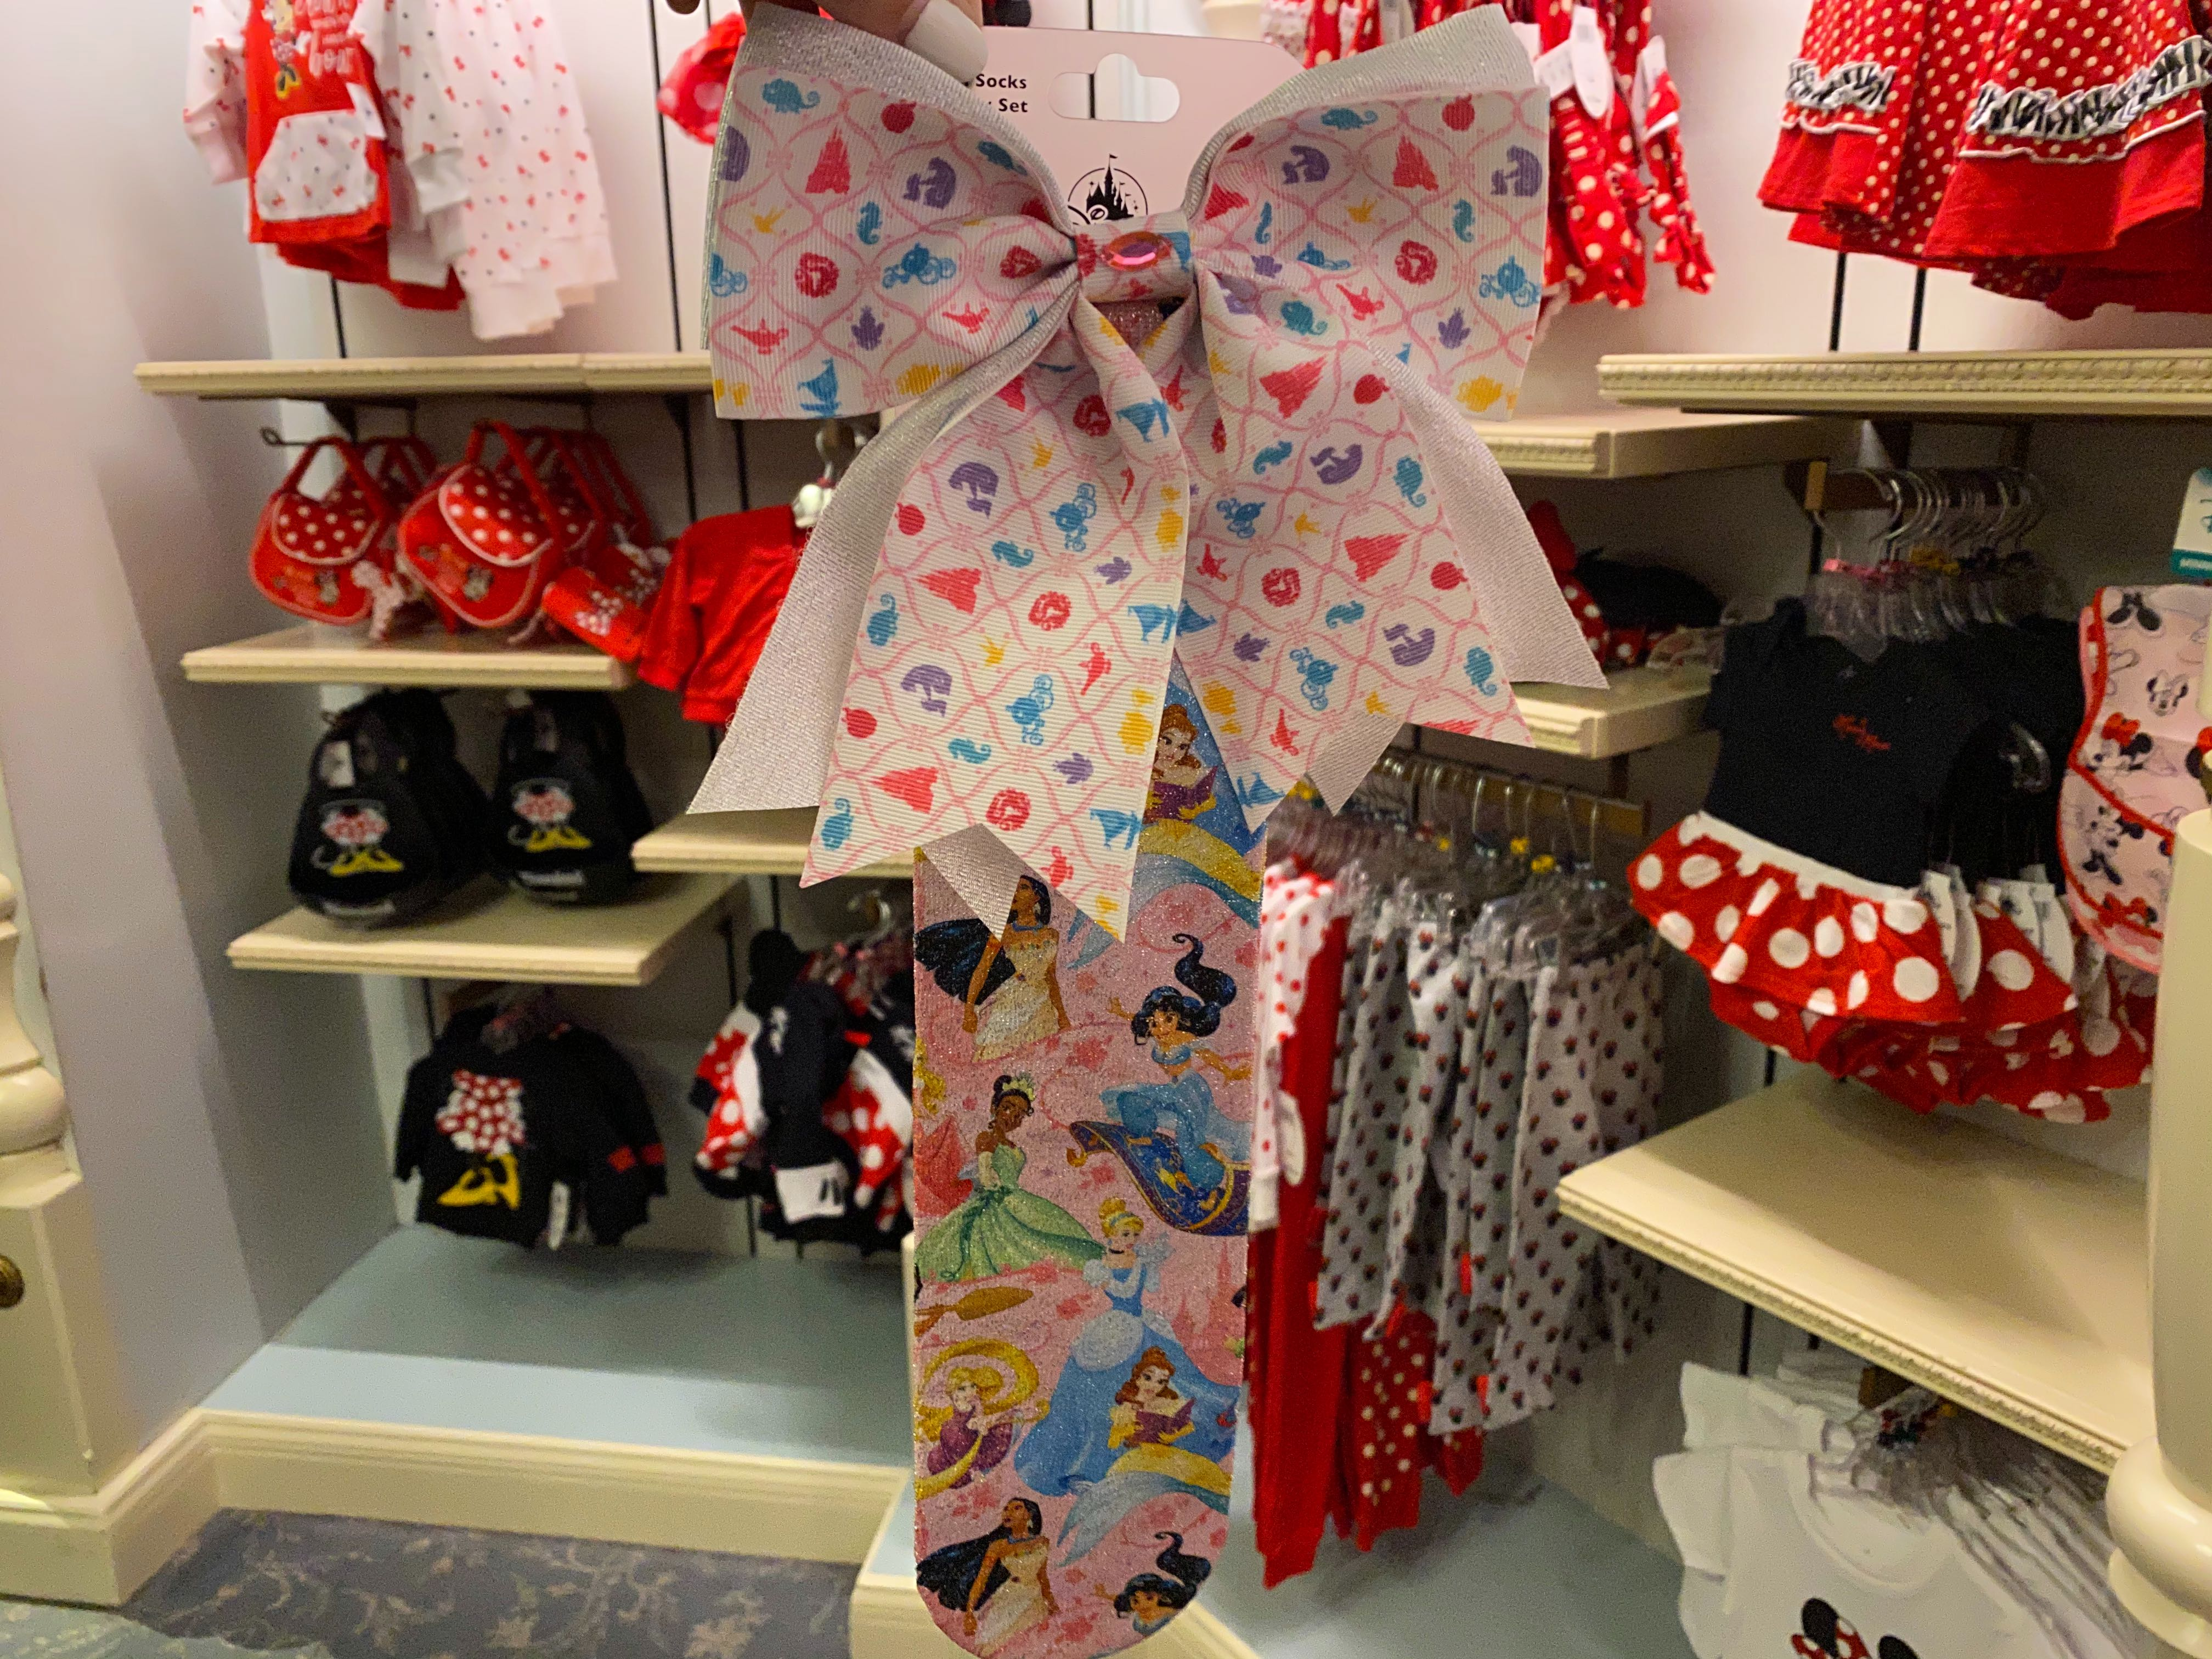 disneyland-princess-kids-merchandise-02-16-2020-4.jpg